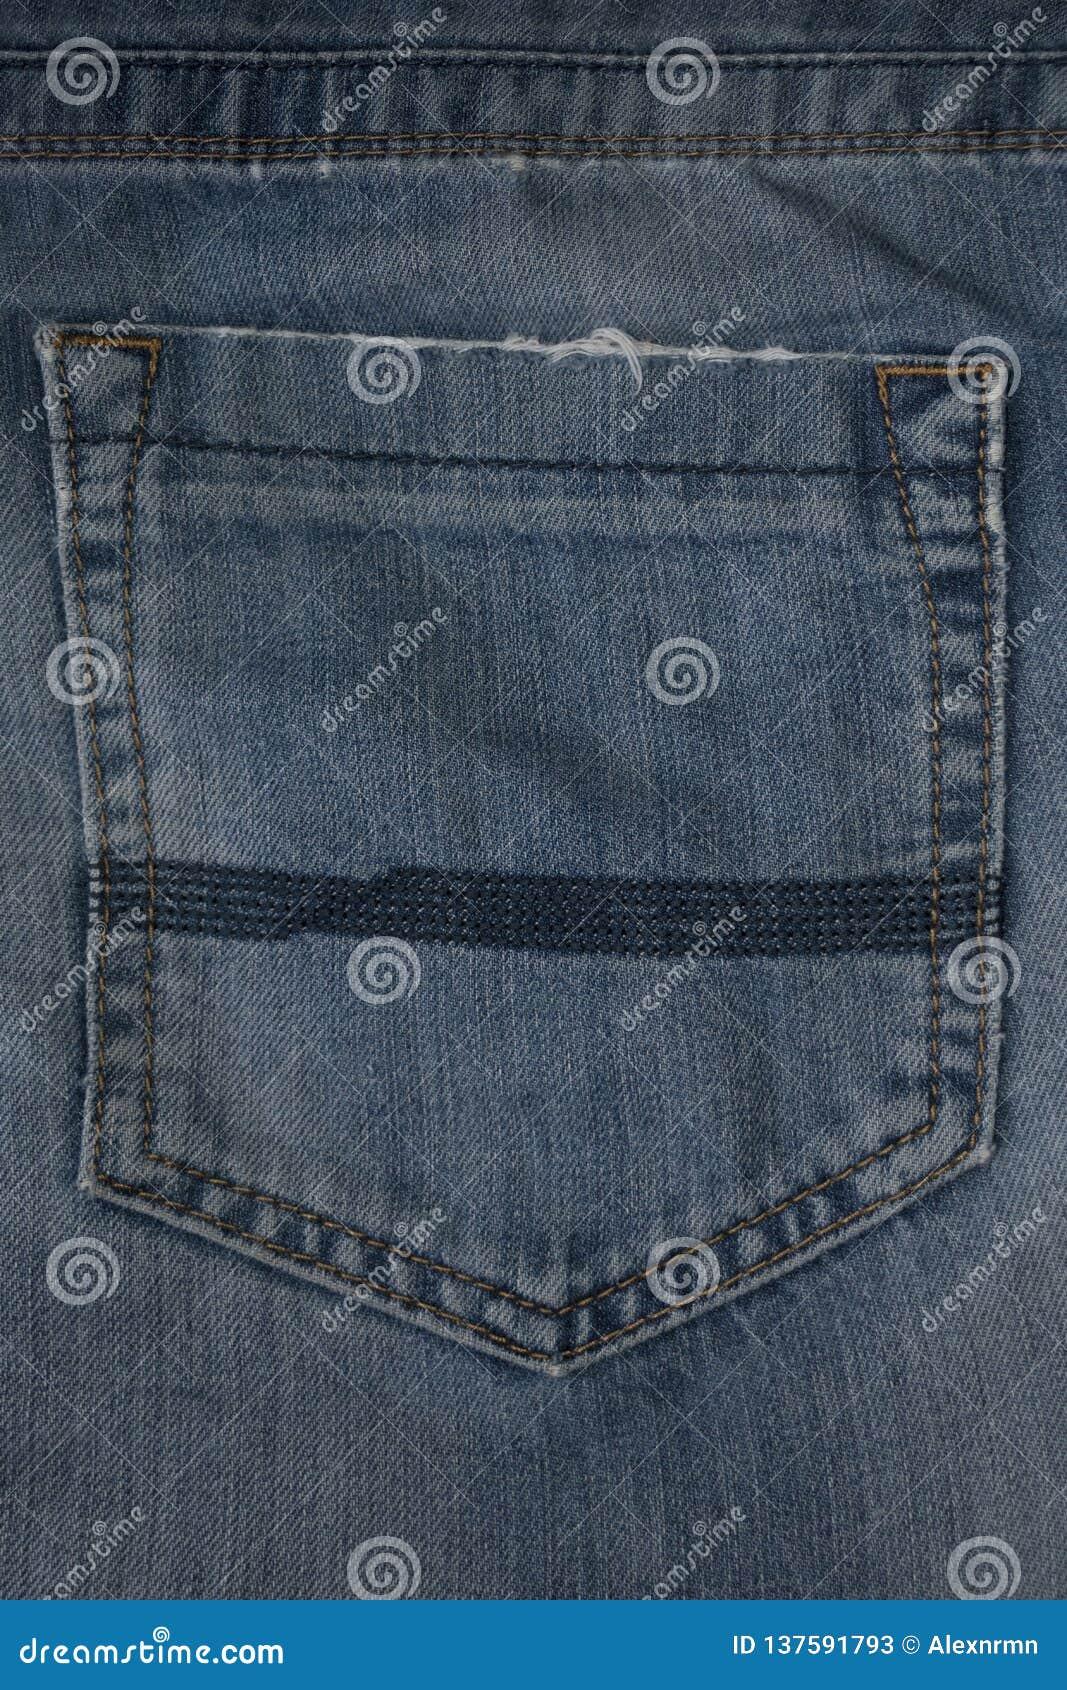 Fundo da textura da sarja de Nimes, calças de brim gastas e bolso da sarja de Nimes